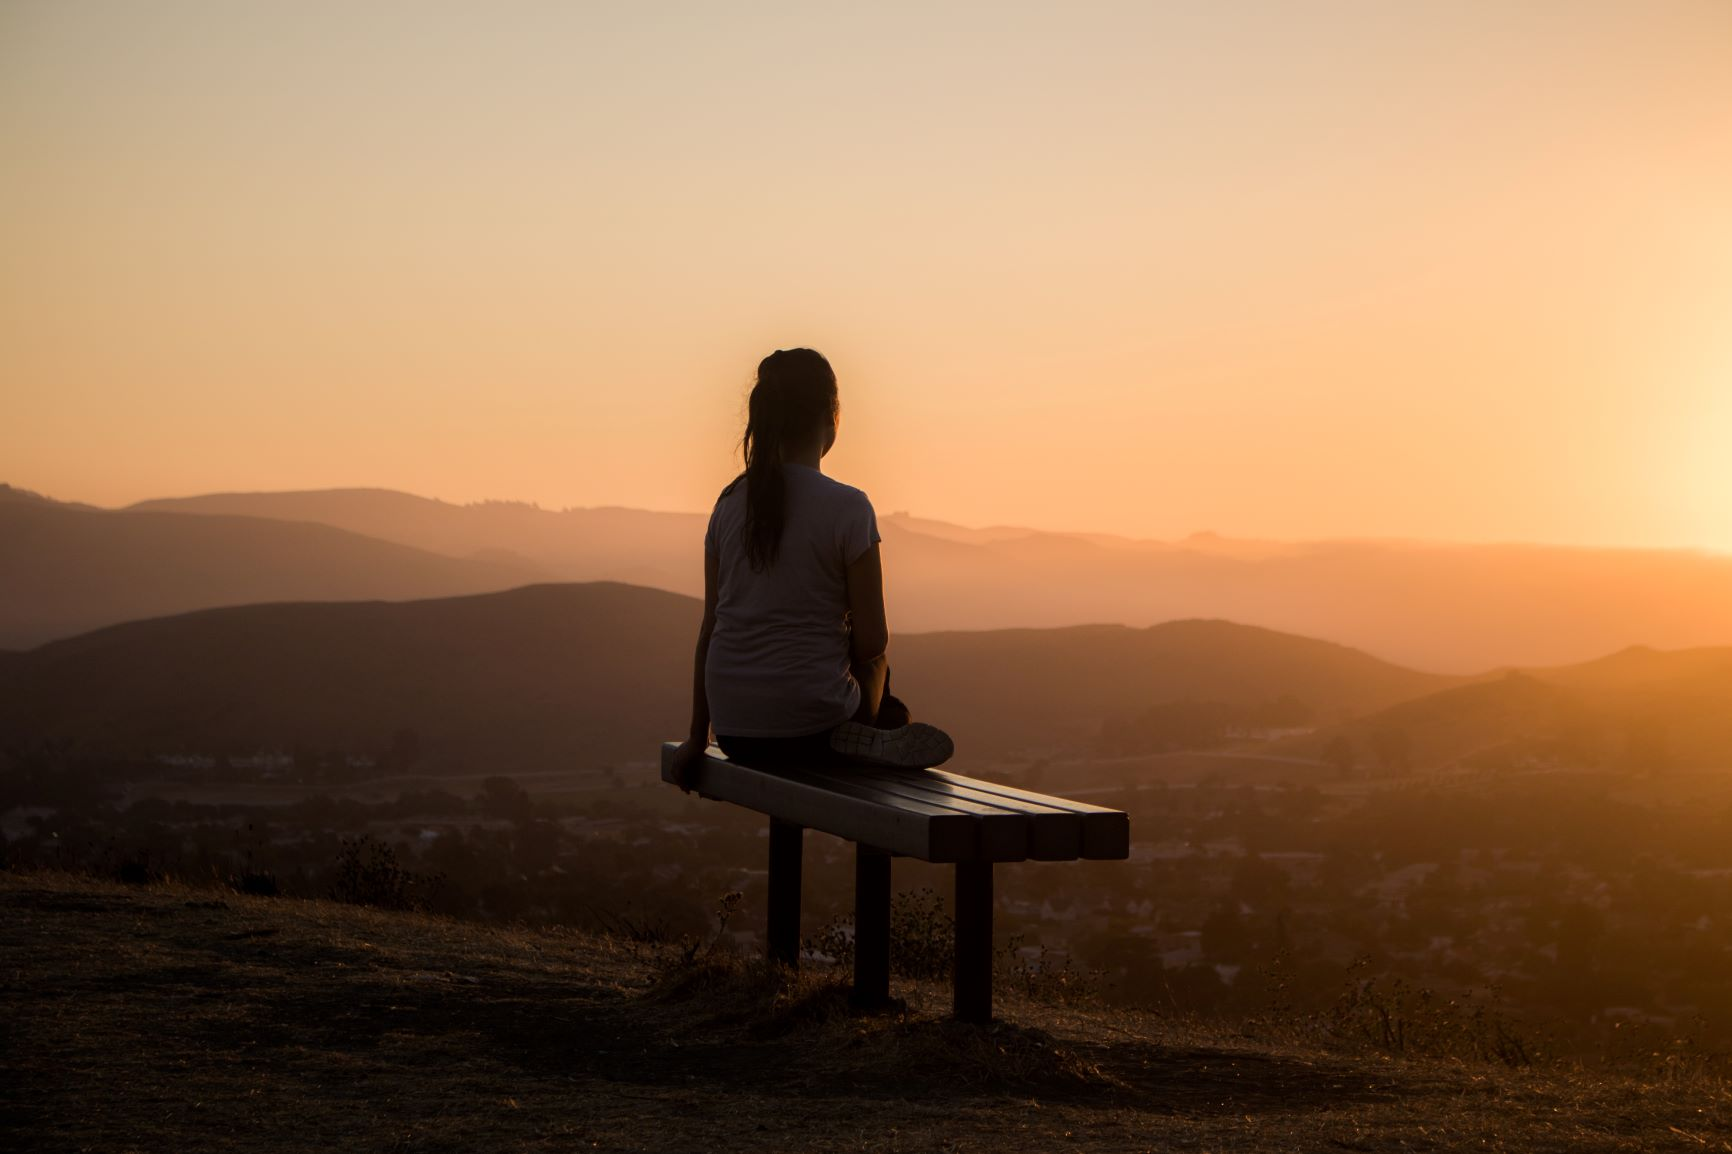 Woman on bench looking at horizon